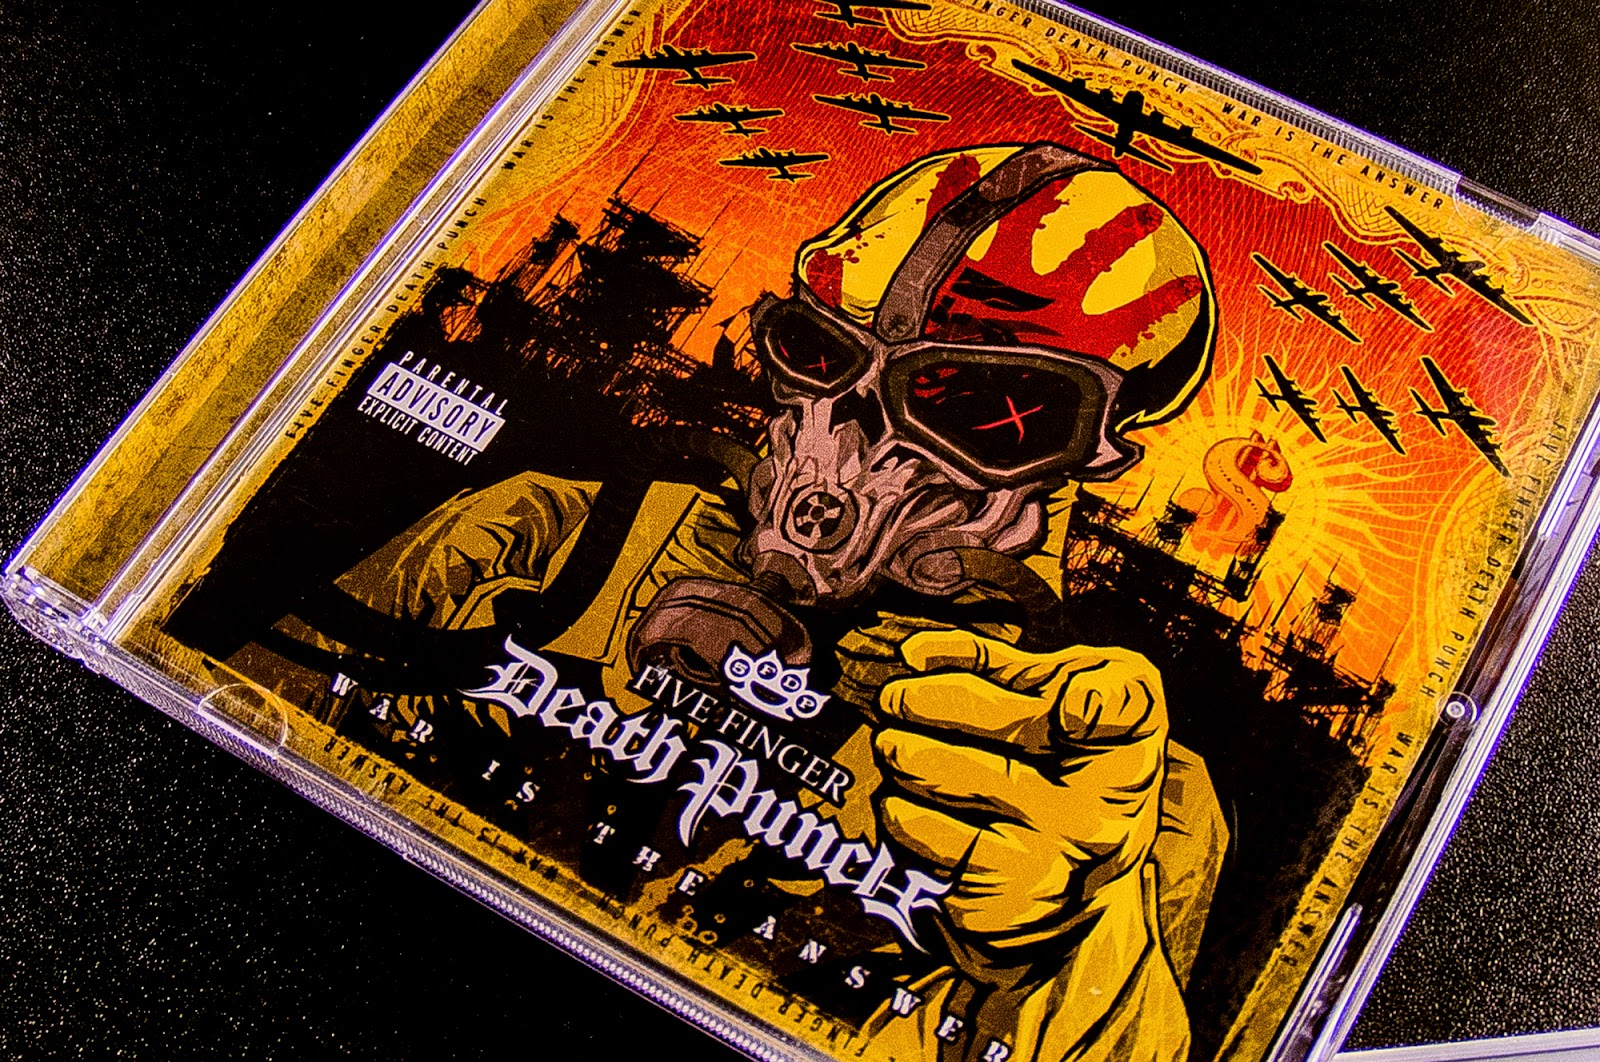 Trenton-Blizzard-Five-Finger-Death-Punch-CD